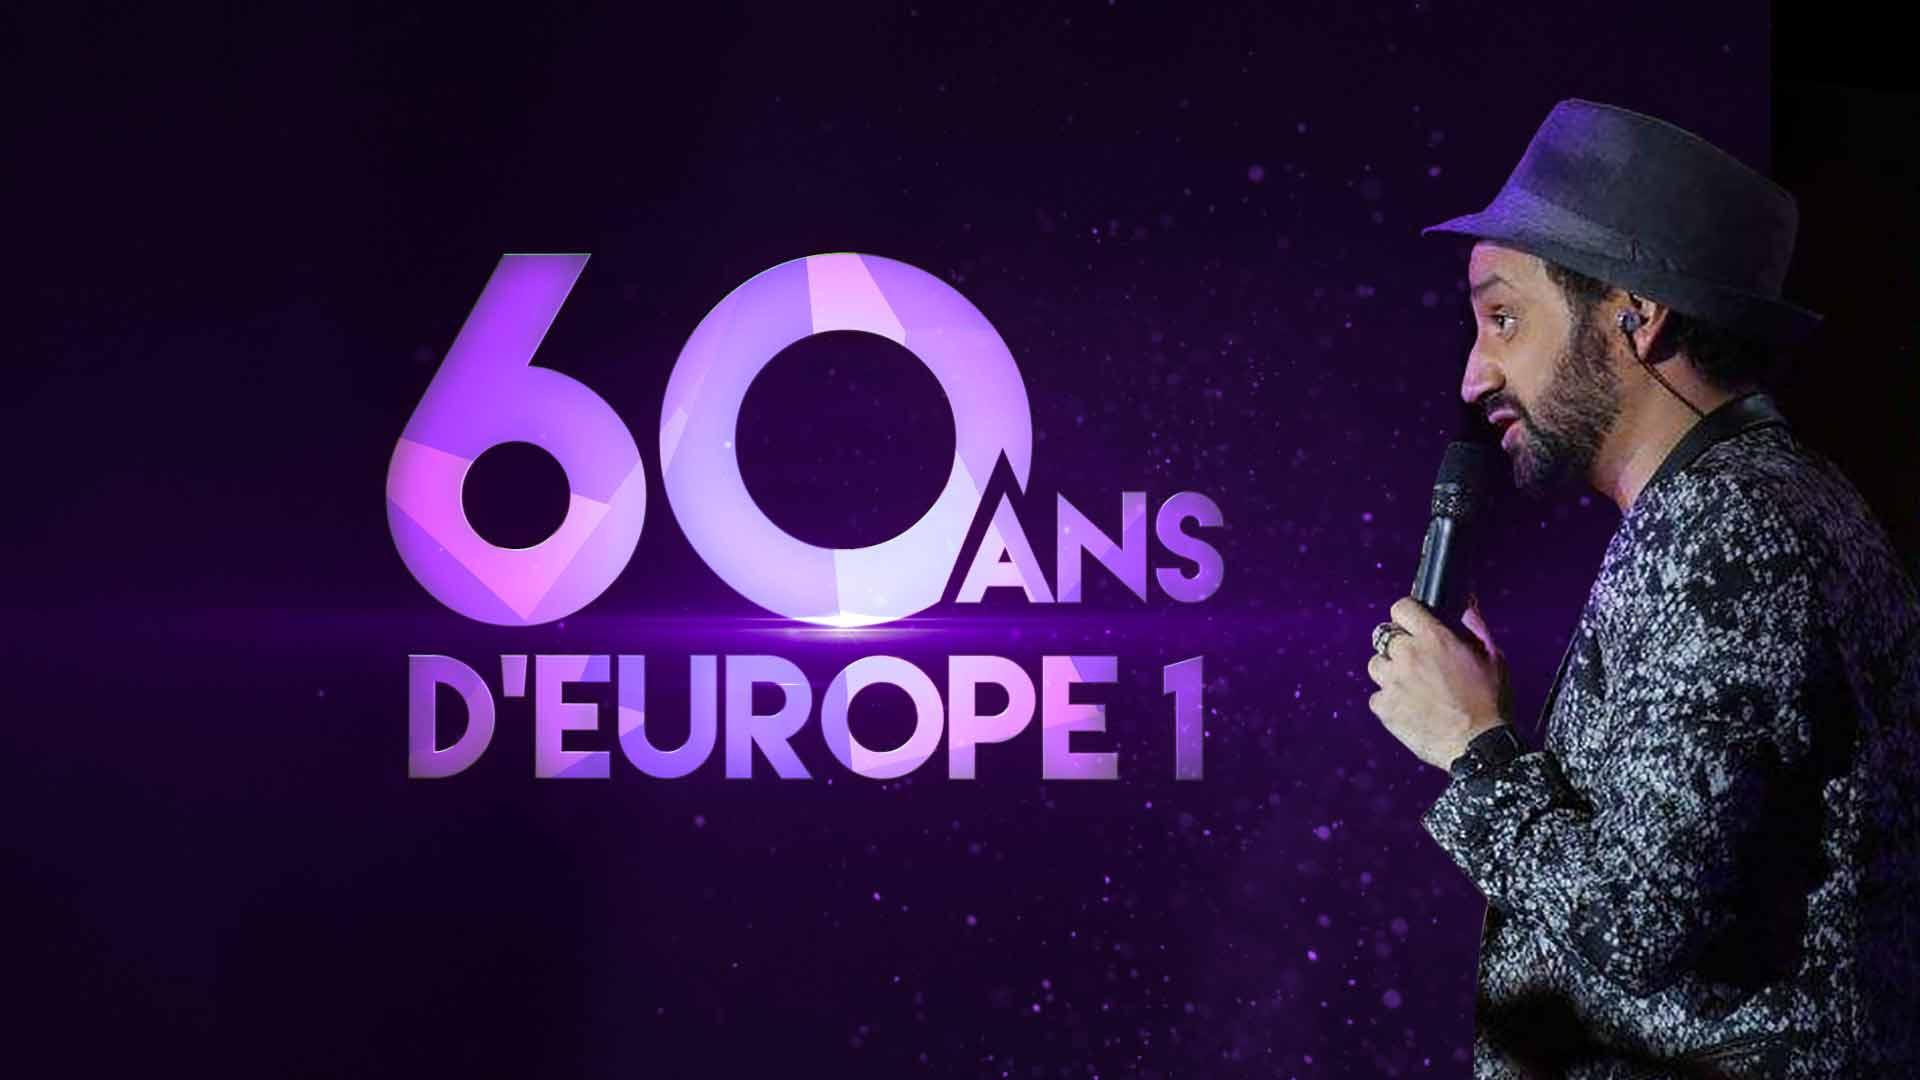 60 ANS D'EUROPE 1